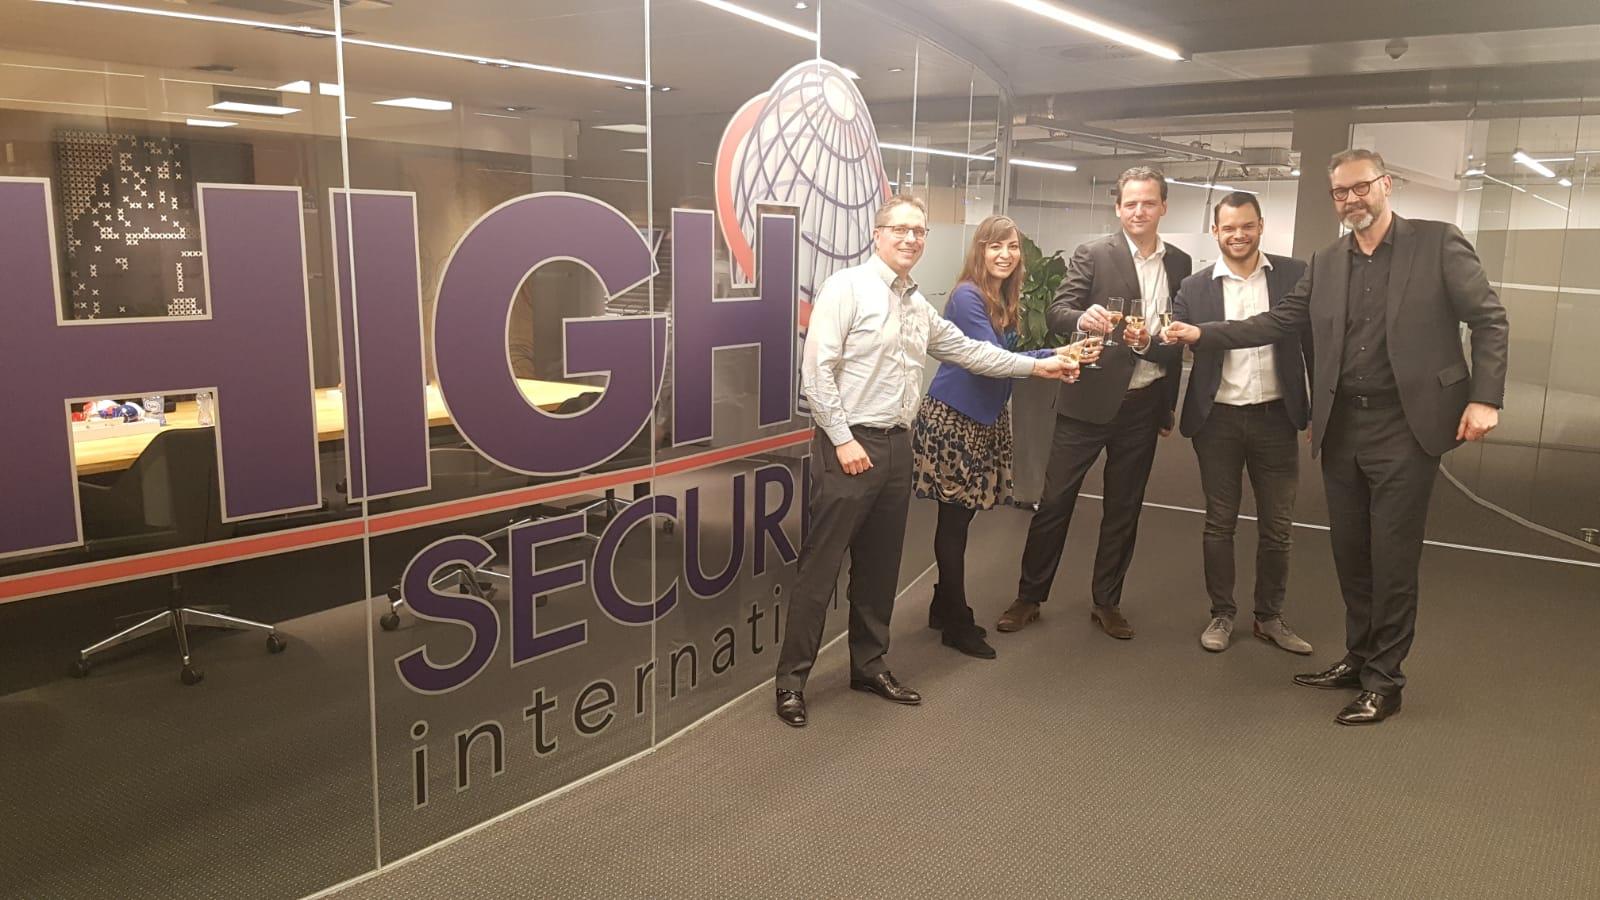 High Security International